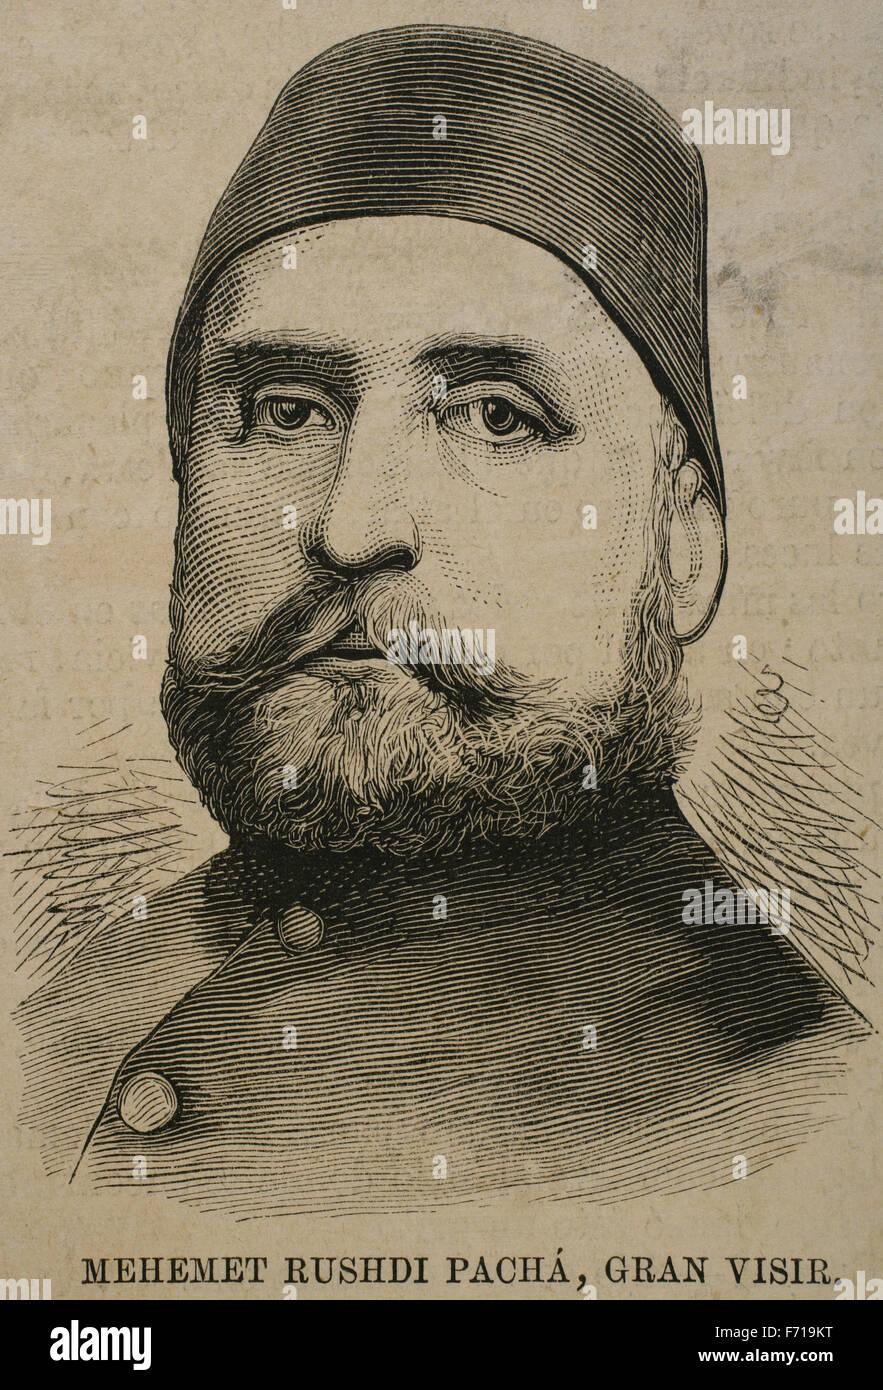 Mehmed Rushdi Pasha (1811-1876). Ottoman statesman. Portrait. Engraving. - Stock Image